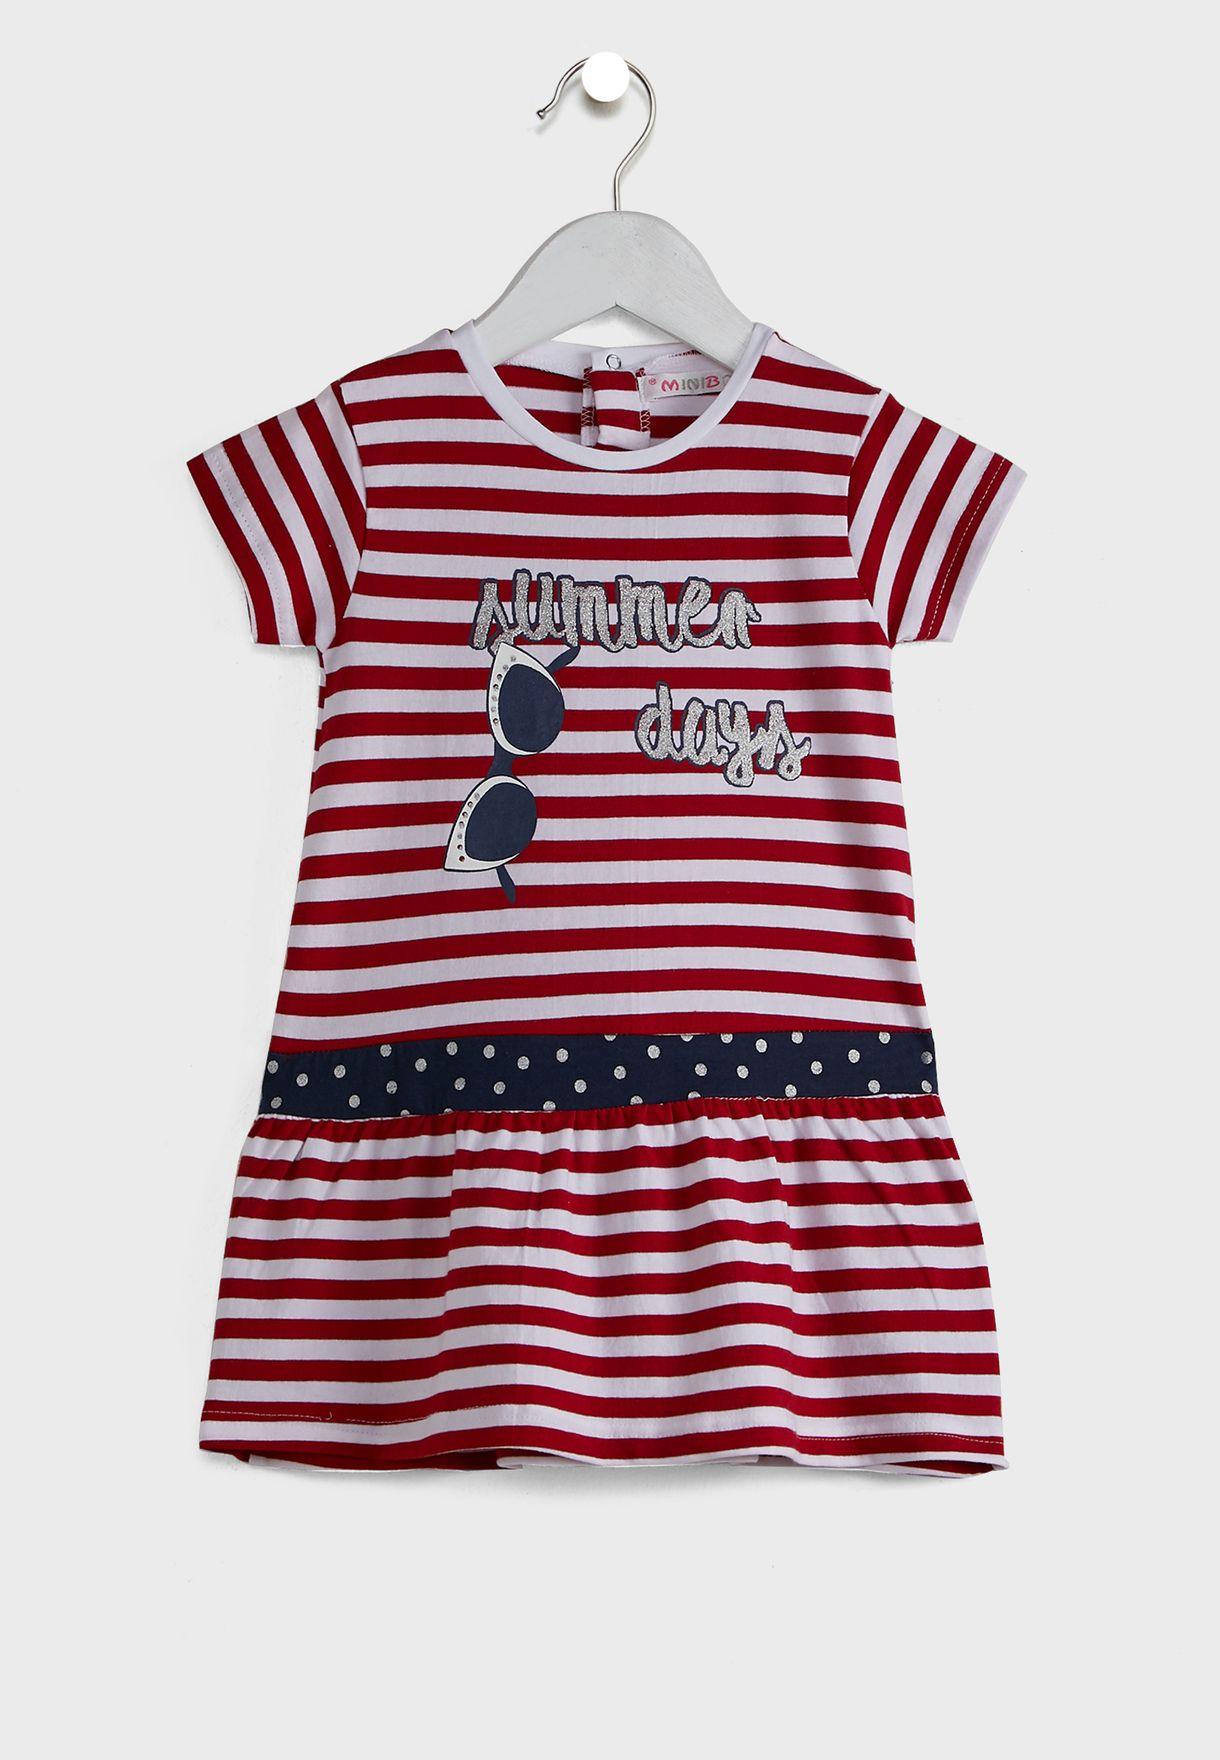 Kids Graphic Dress + Knicker Set